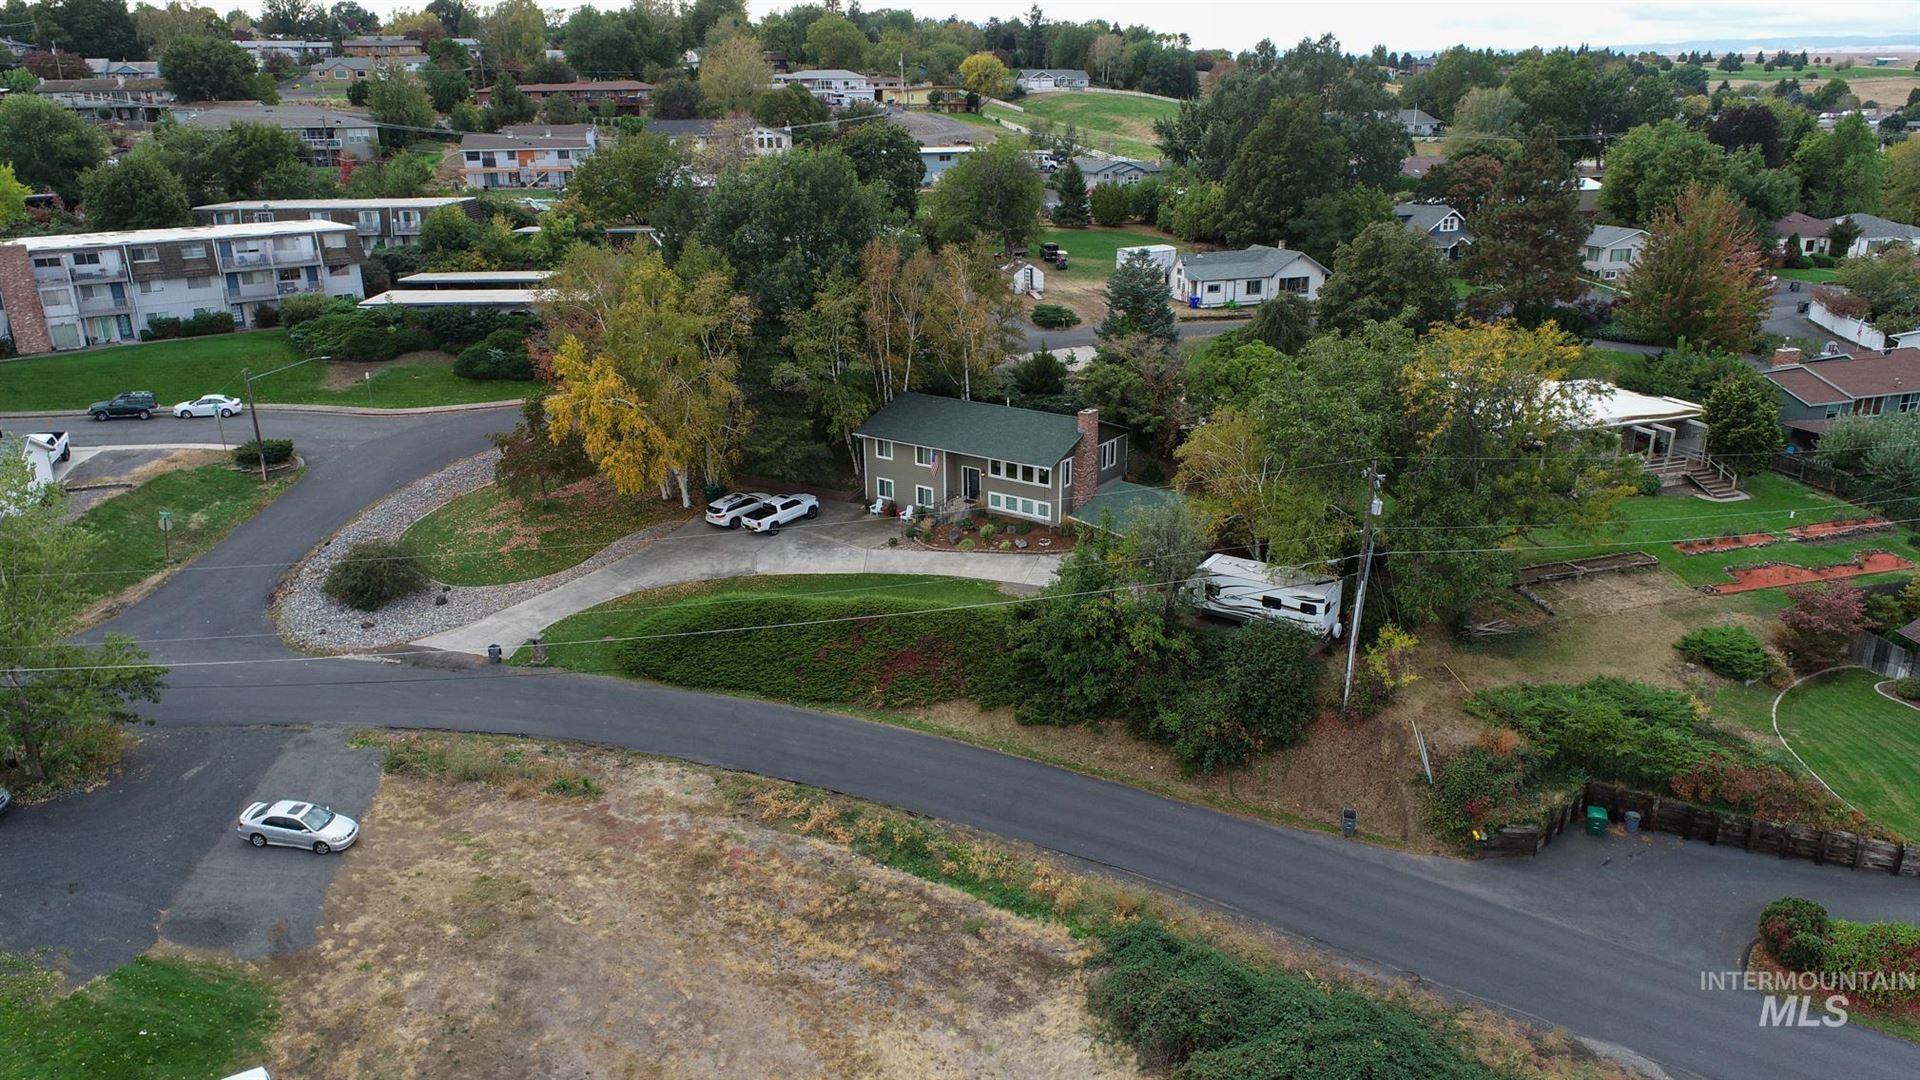 Photo of 1302 Vineyard Drive, Lewiston, ID 83501-6328 (MLS # 98784610)